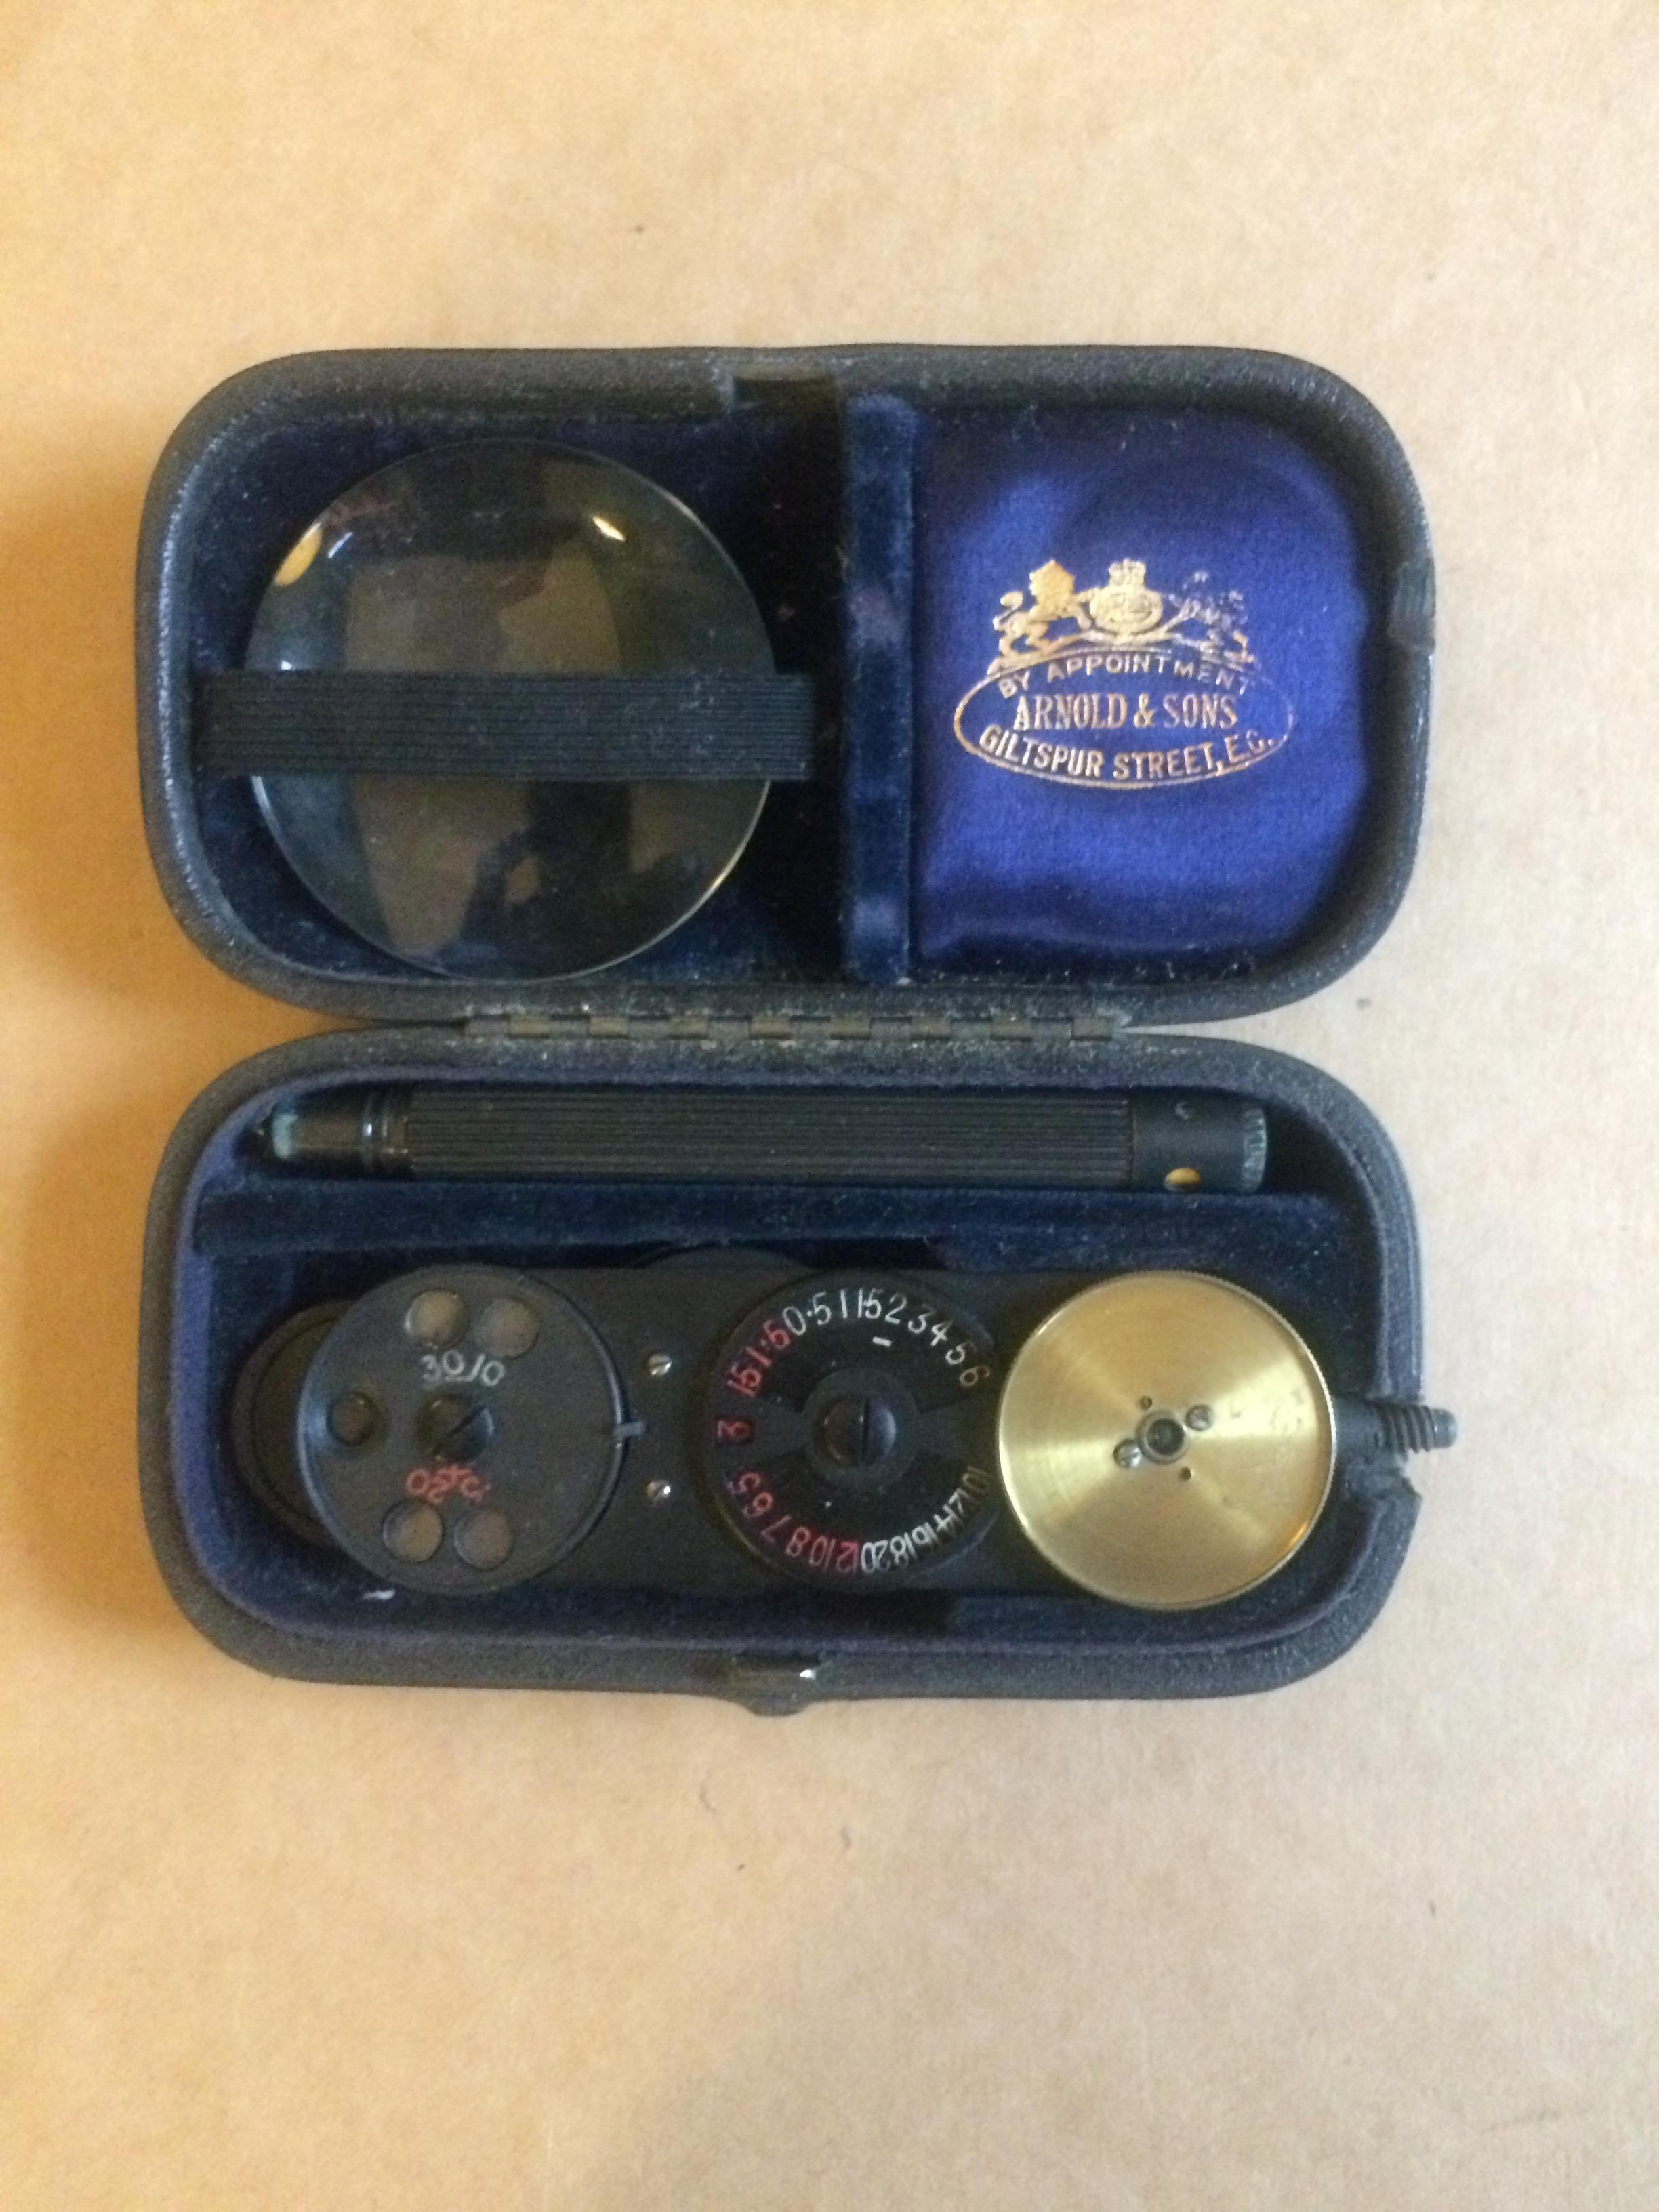 Presentation Ophthalmoscope  'St. Bartholomews Hospital Treasurers Prize, 1921' to A. B. H. Simpson.